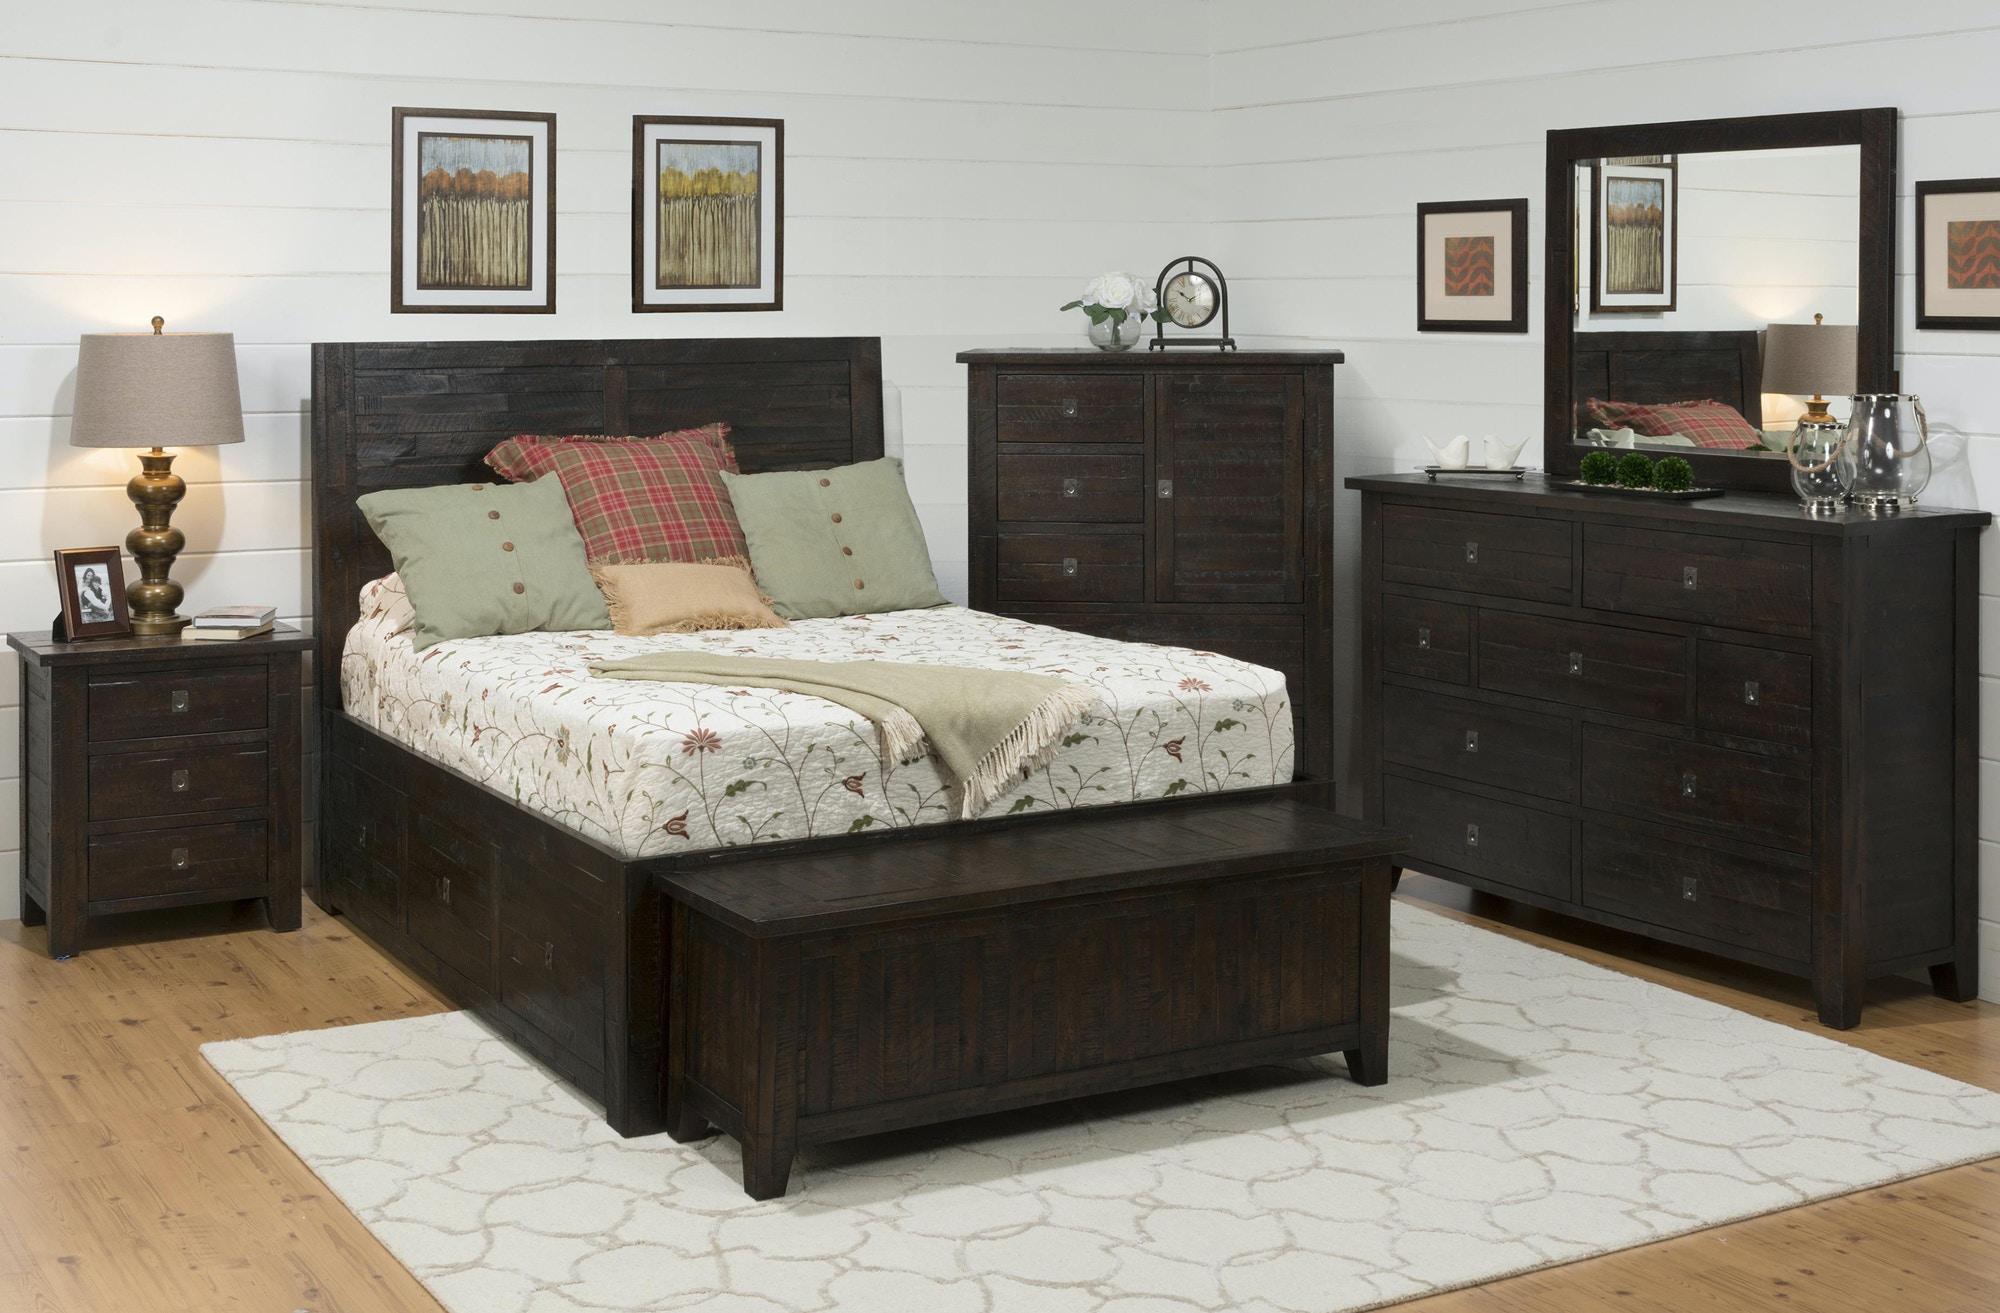 Jofran Bedroom Kona Grove Dresser 053664 Furniture Fair Cincinnati Dayton Oh And Northern Ky